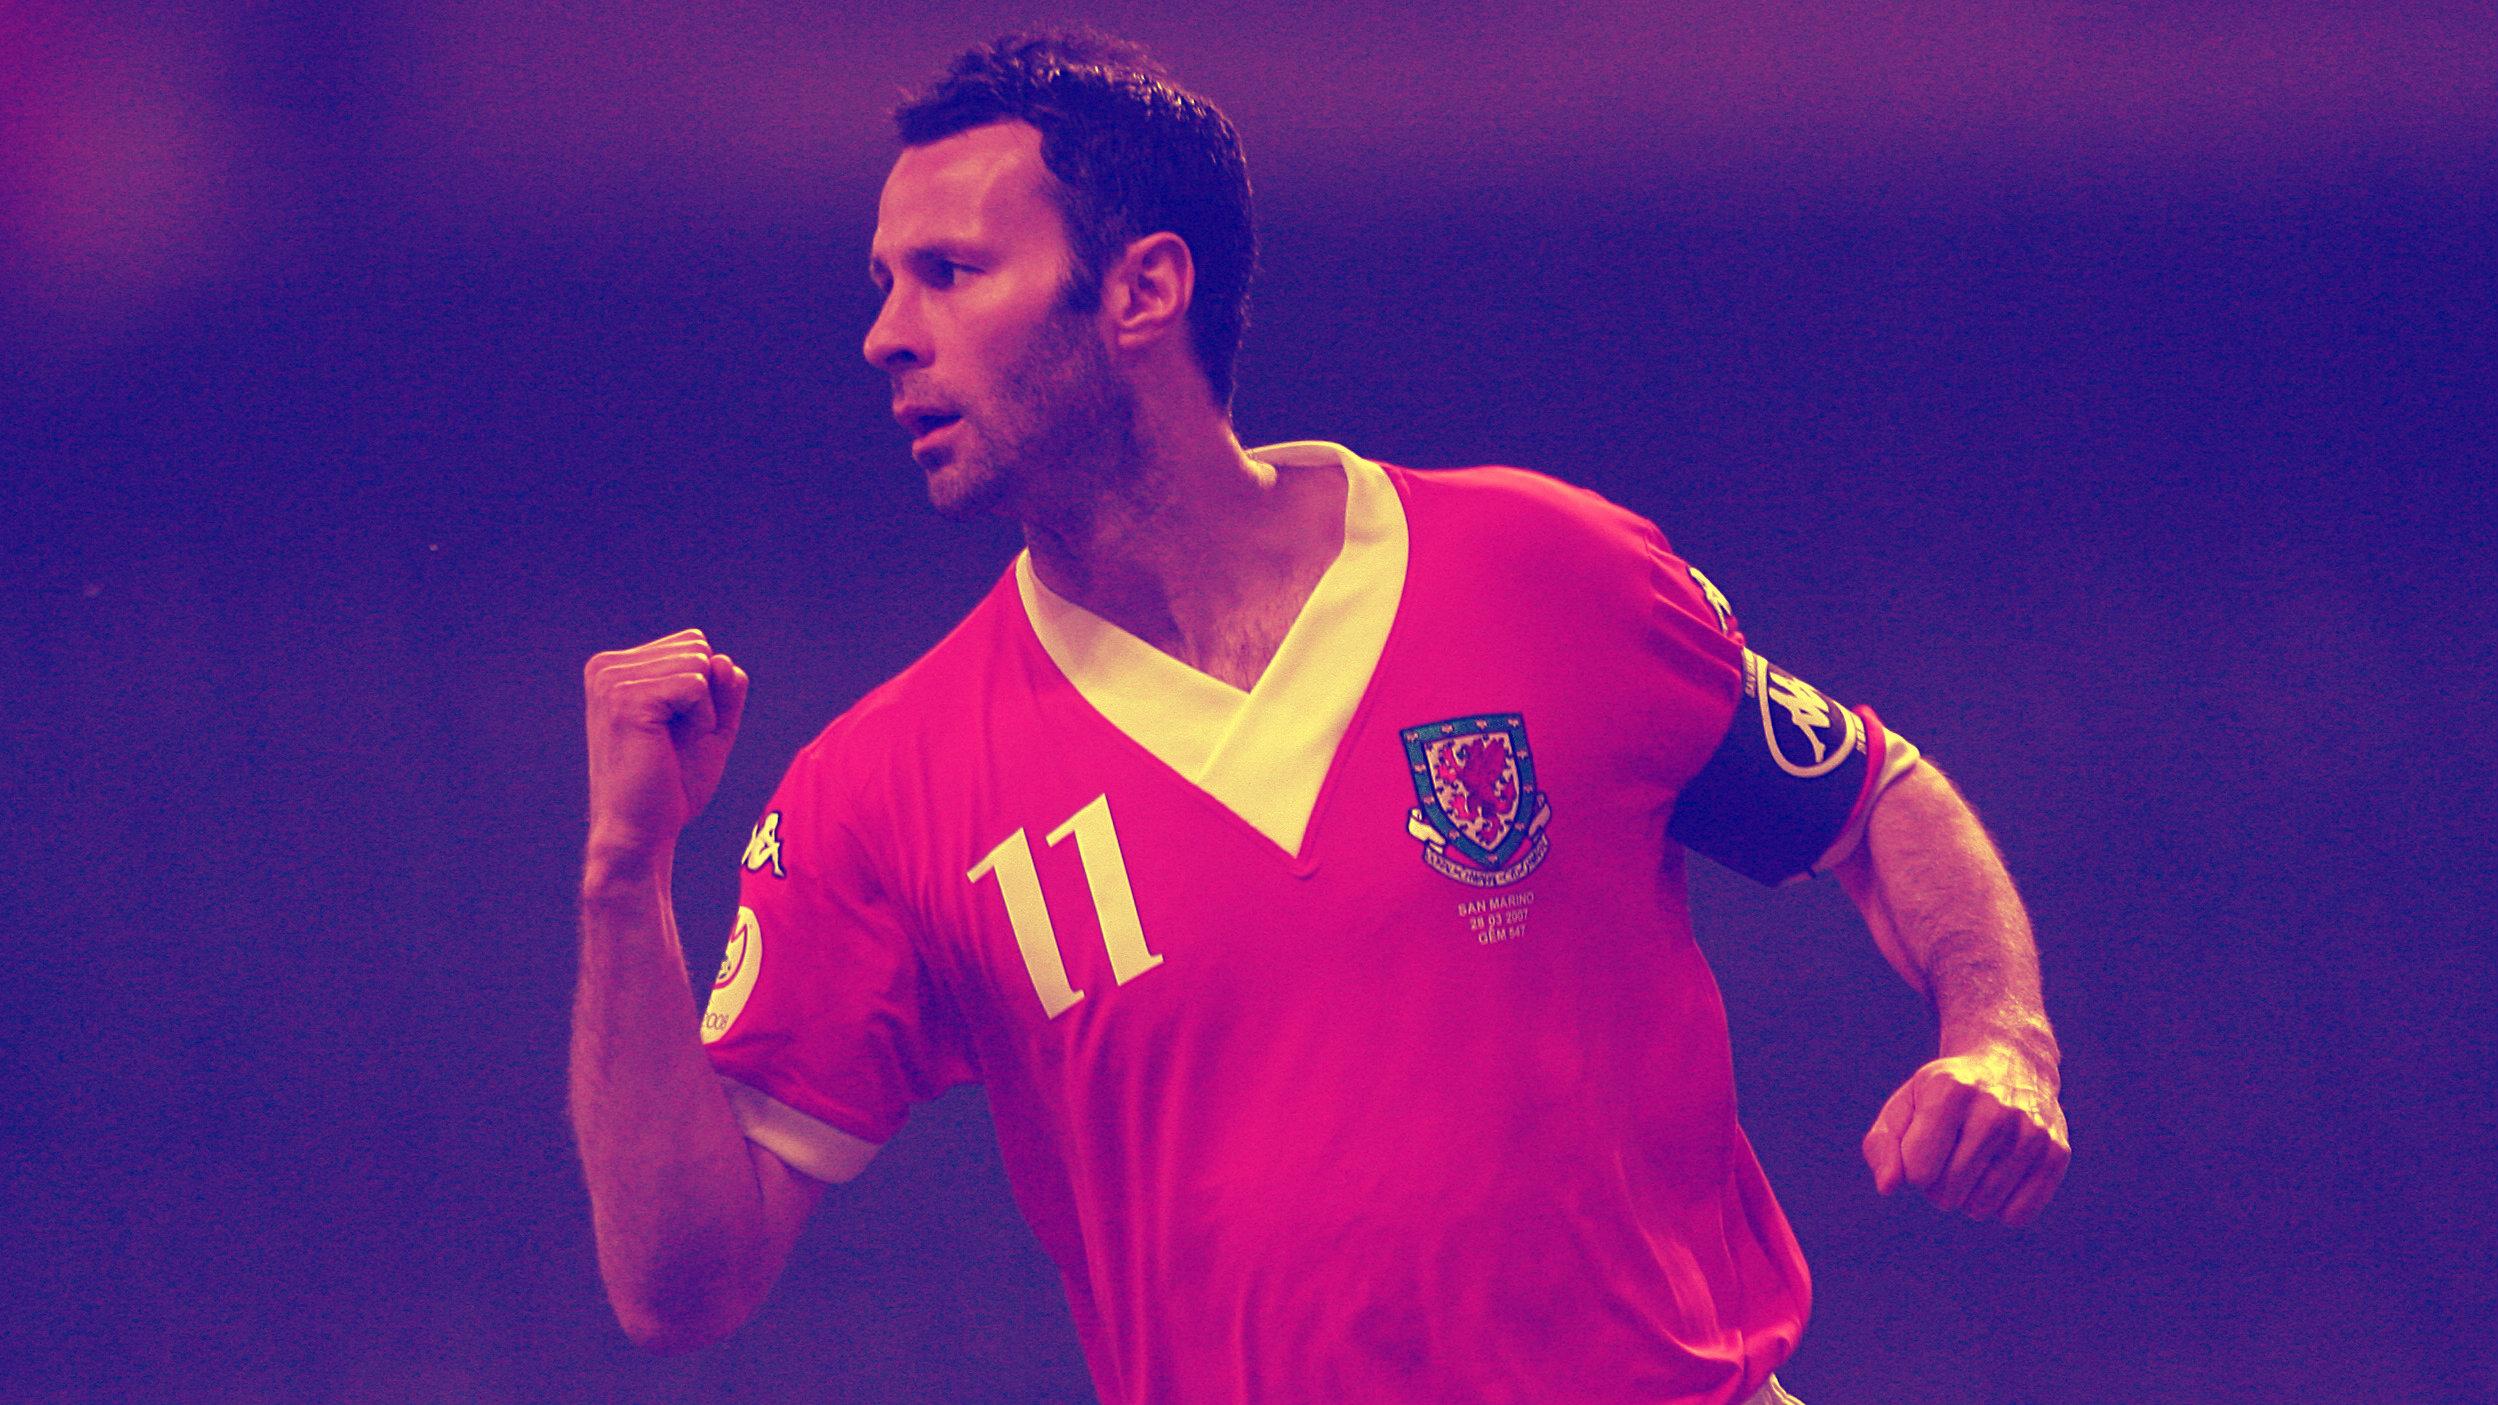 8 Pemain Top Yang Tidak Pernah Bermain Di Piala Dunia Ligalaga